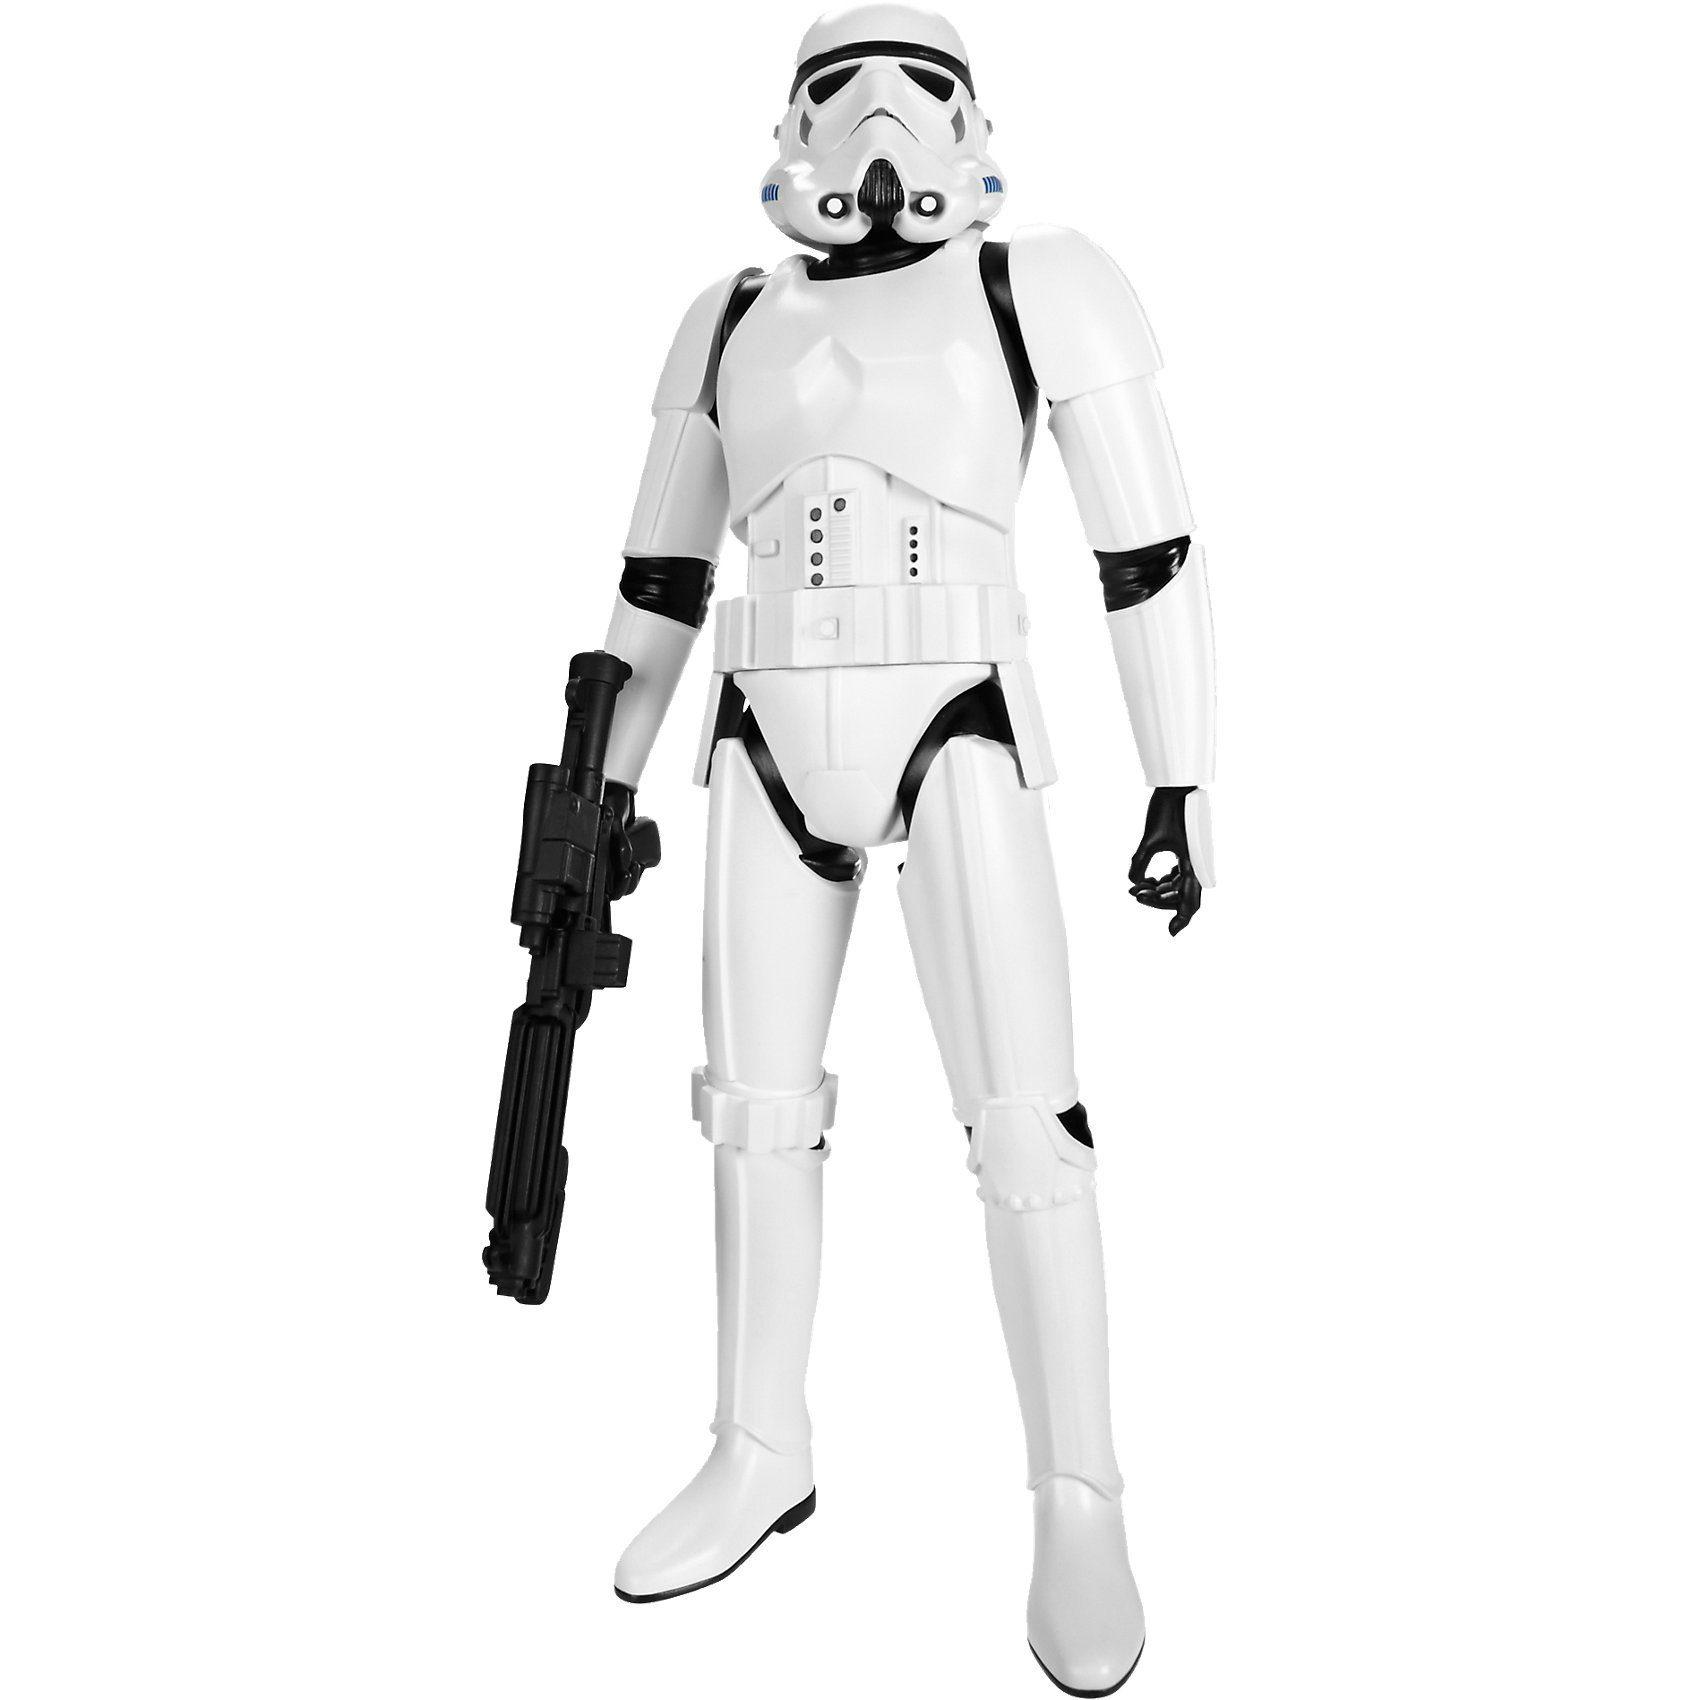 Jakks Pacific Star Wars Rogue one - Imperial Stormtrooper, 50 cm